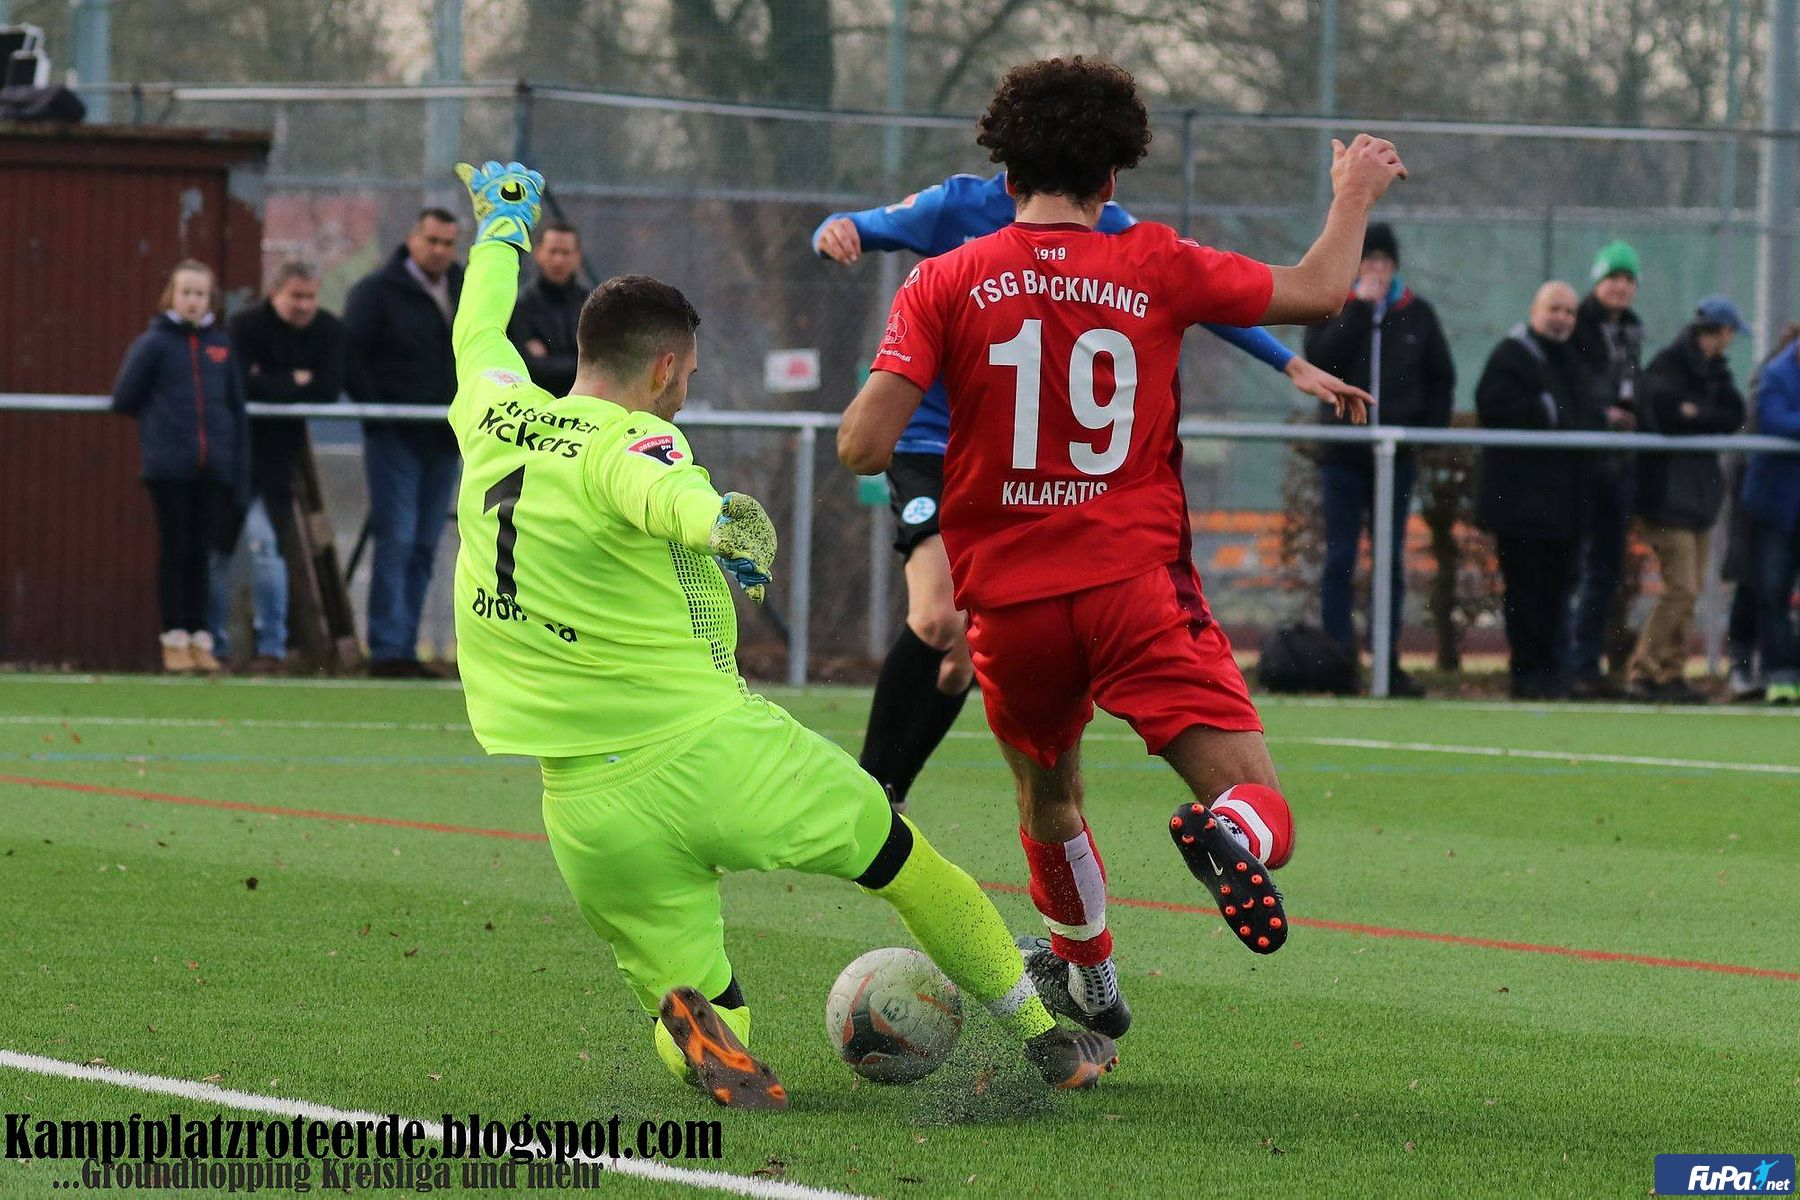 Gelungener Test gegen die Stuttgarter Kickers